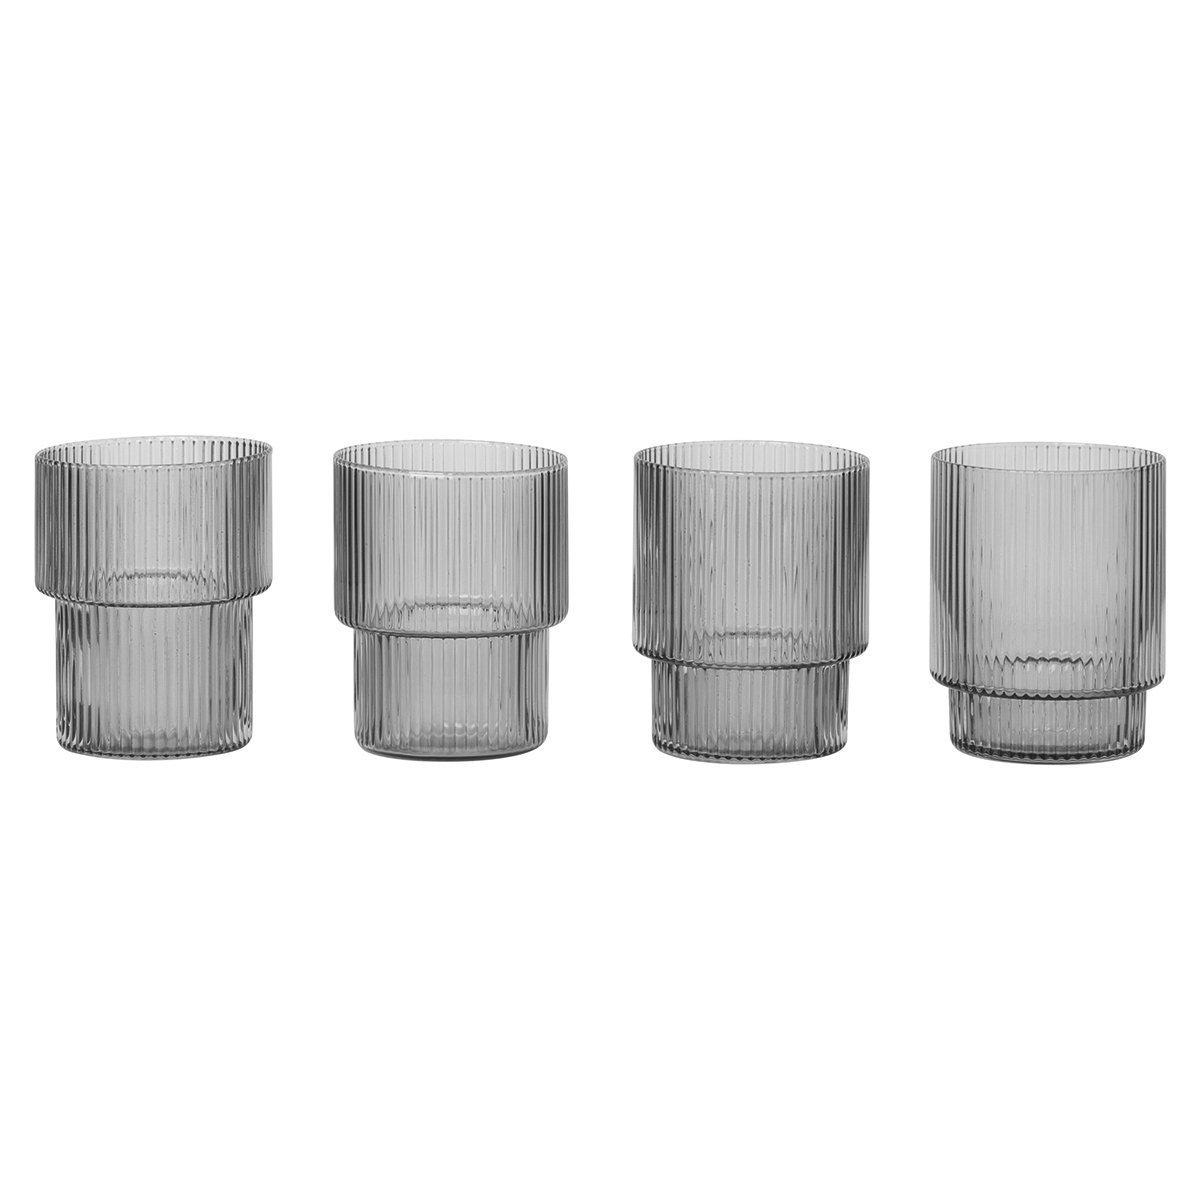 Ferm Living Ripple Glas - Transparant & Grijs Gerookt